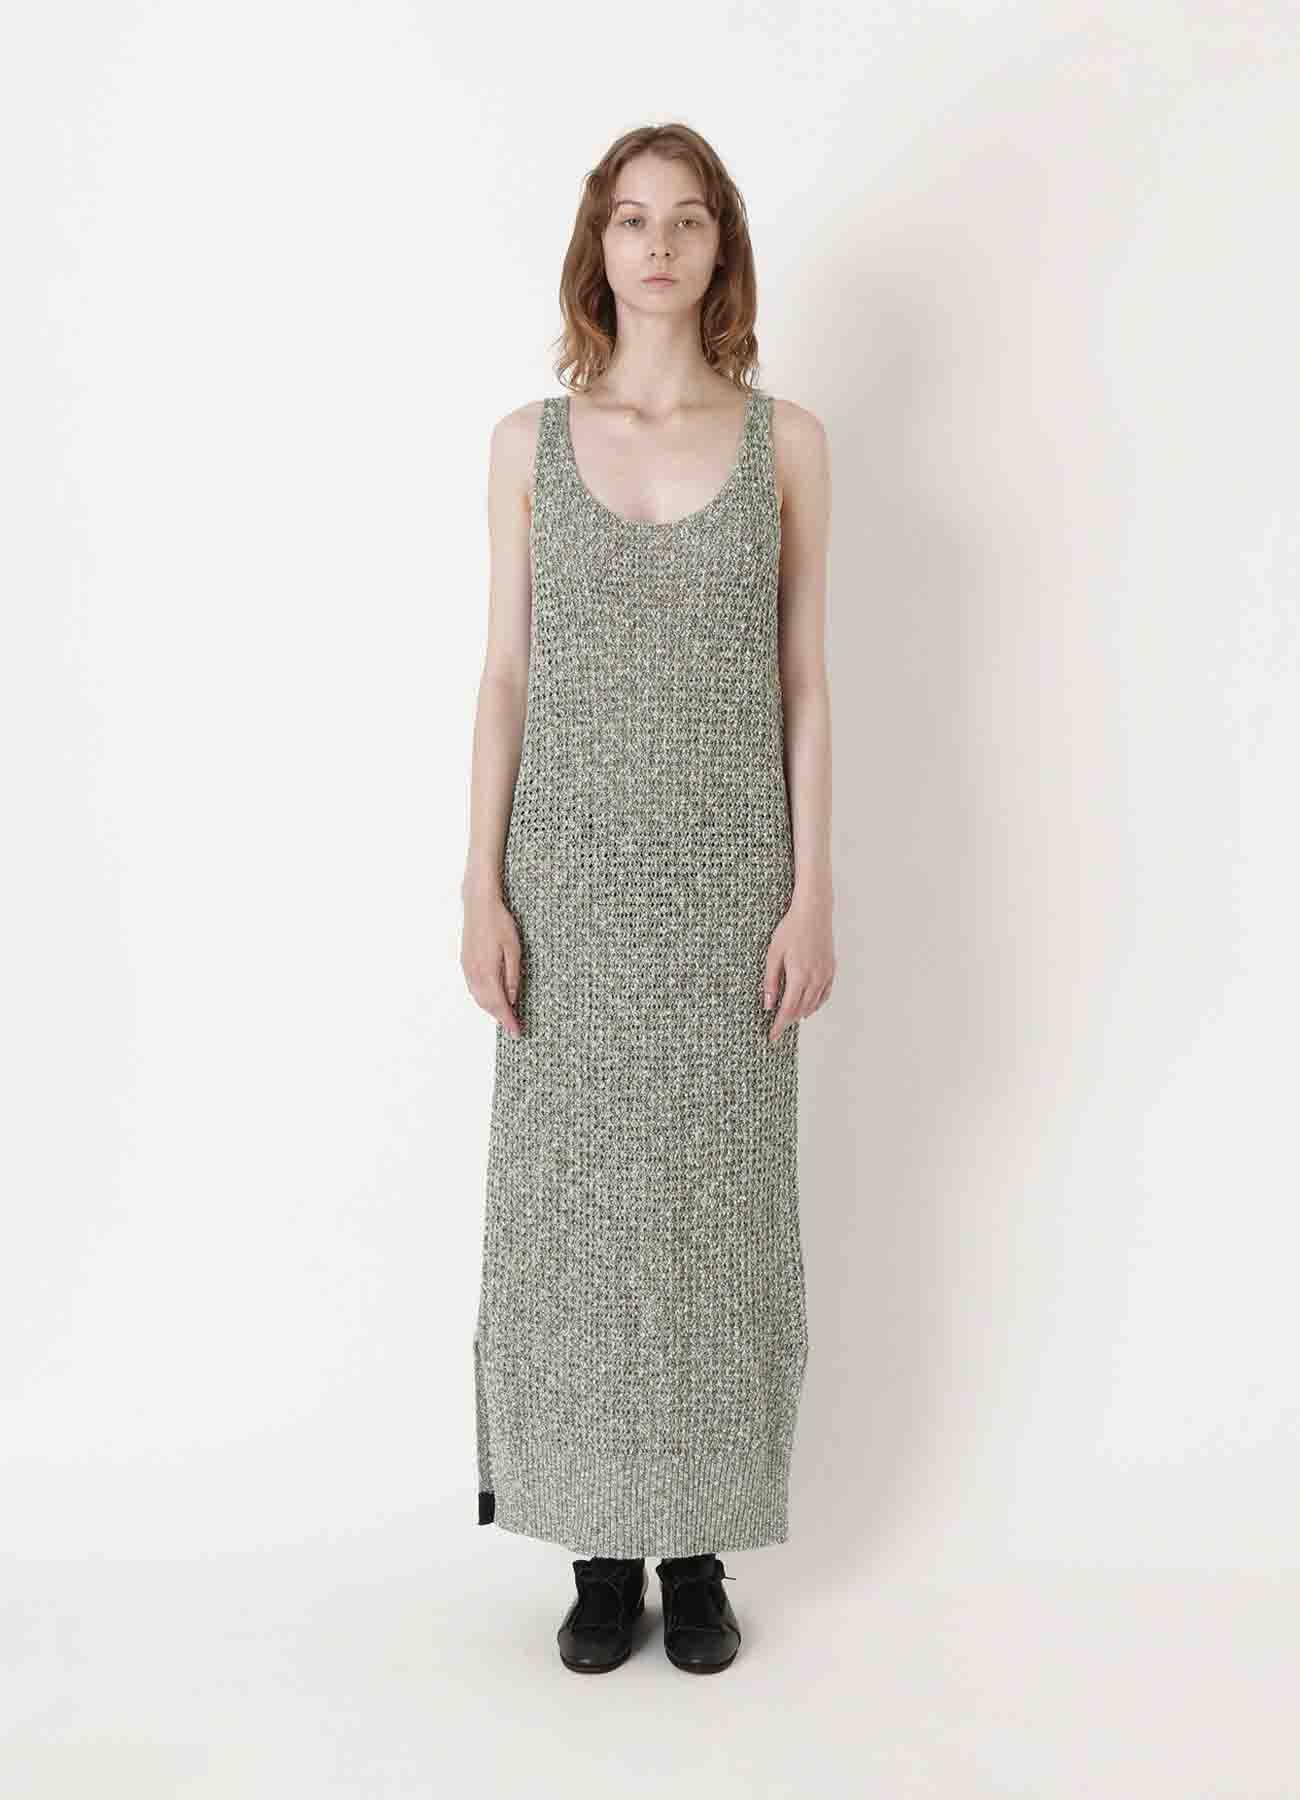 RISMATbyY's RIB COLOURED SLEEVE LESS DRESS